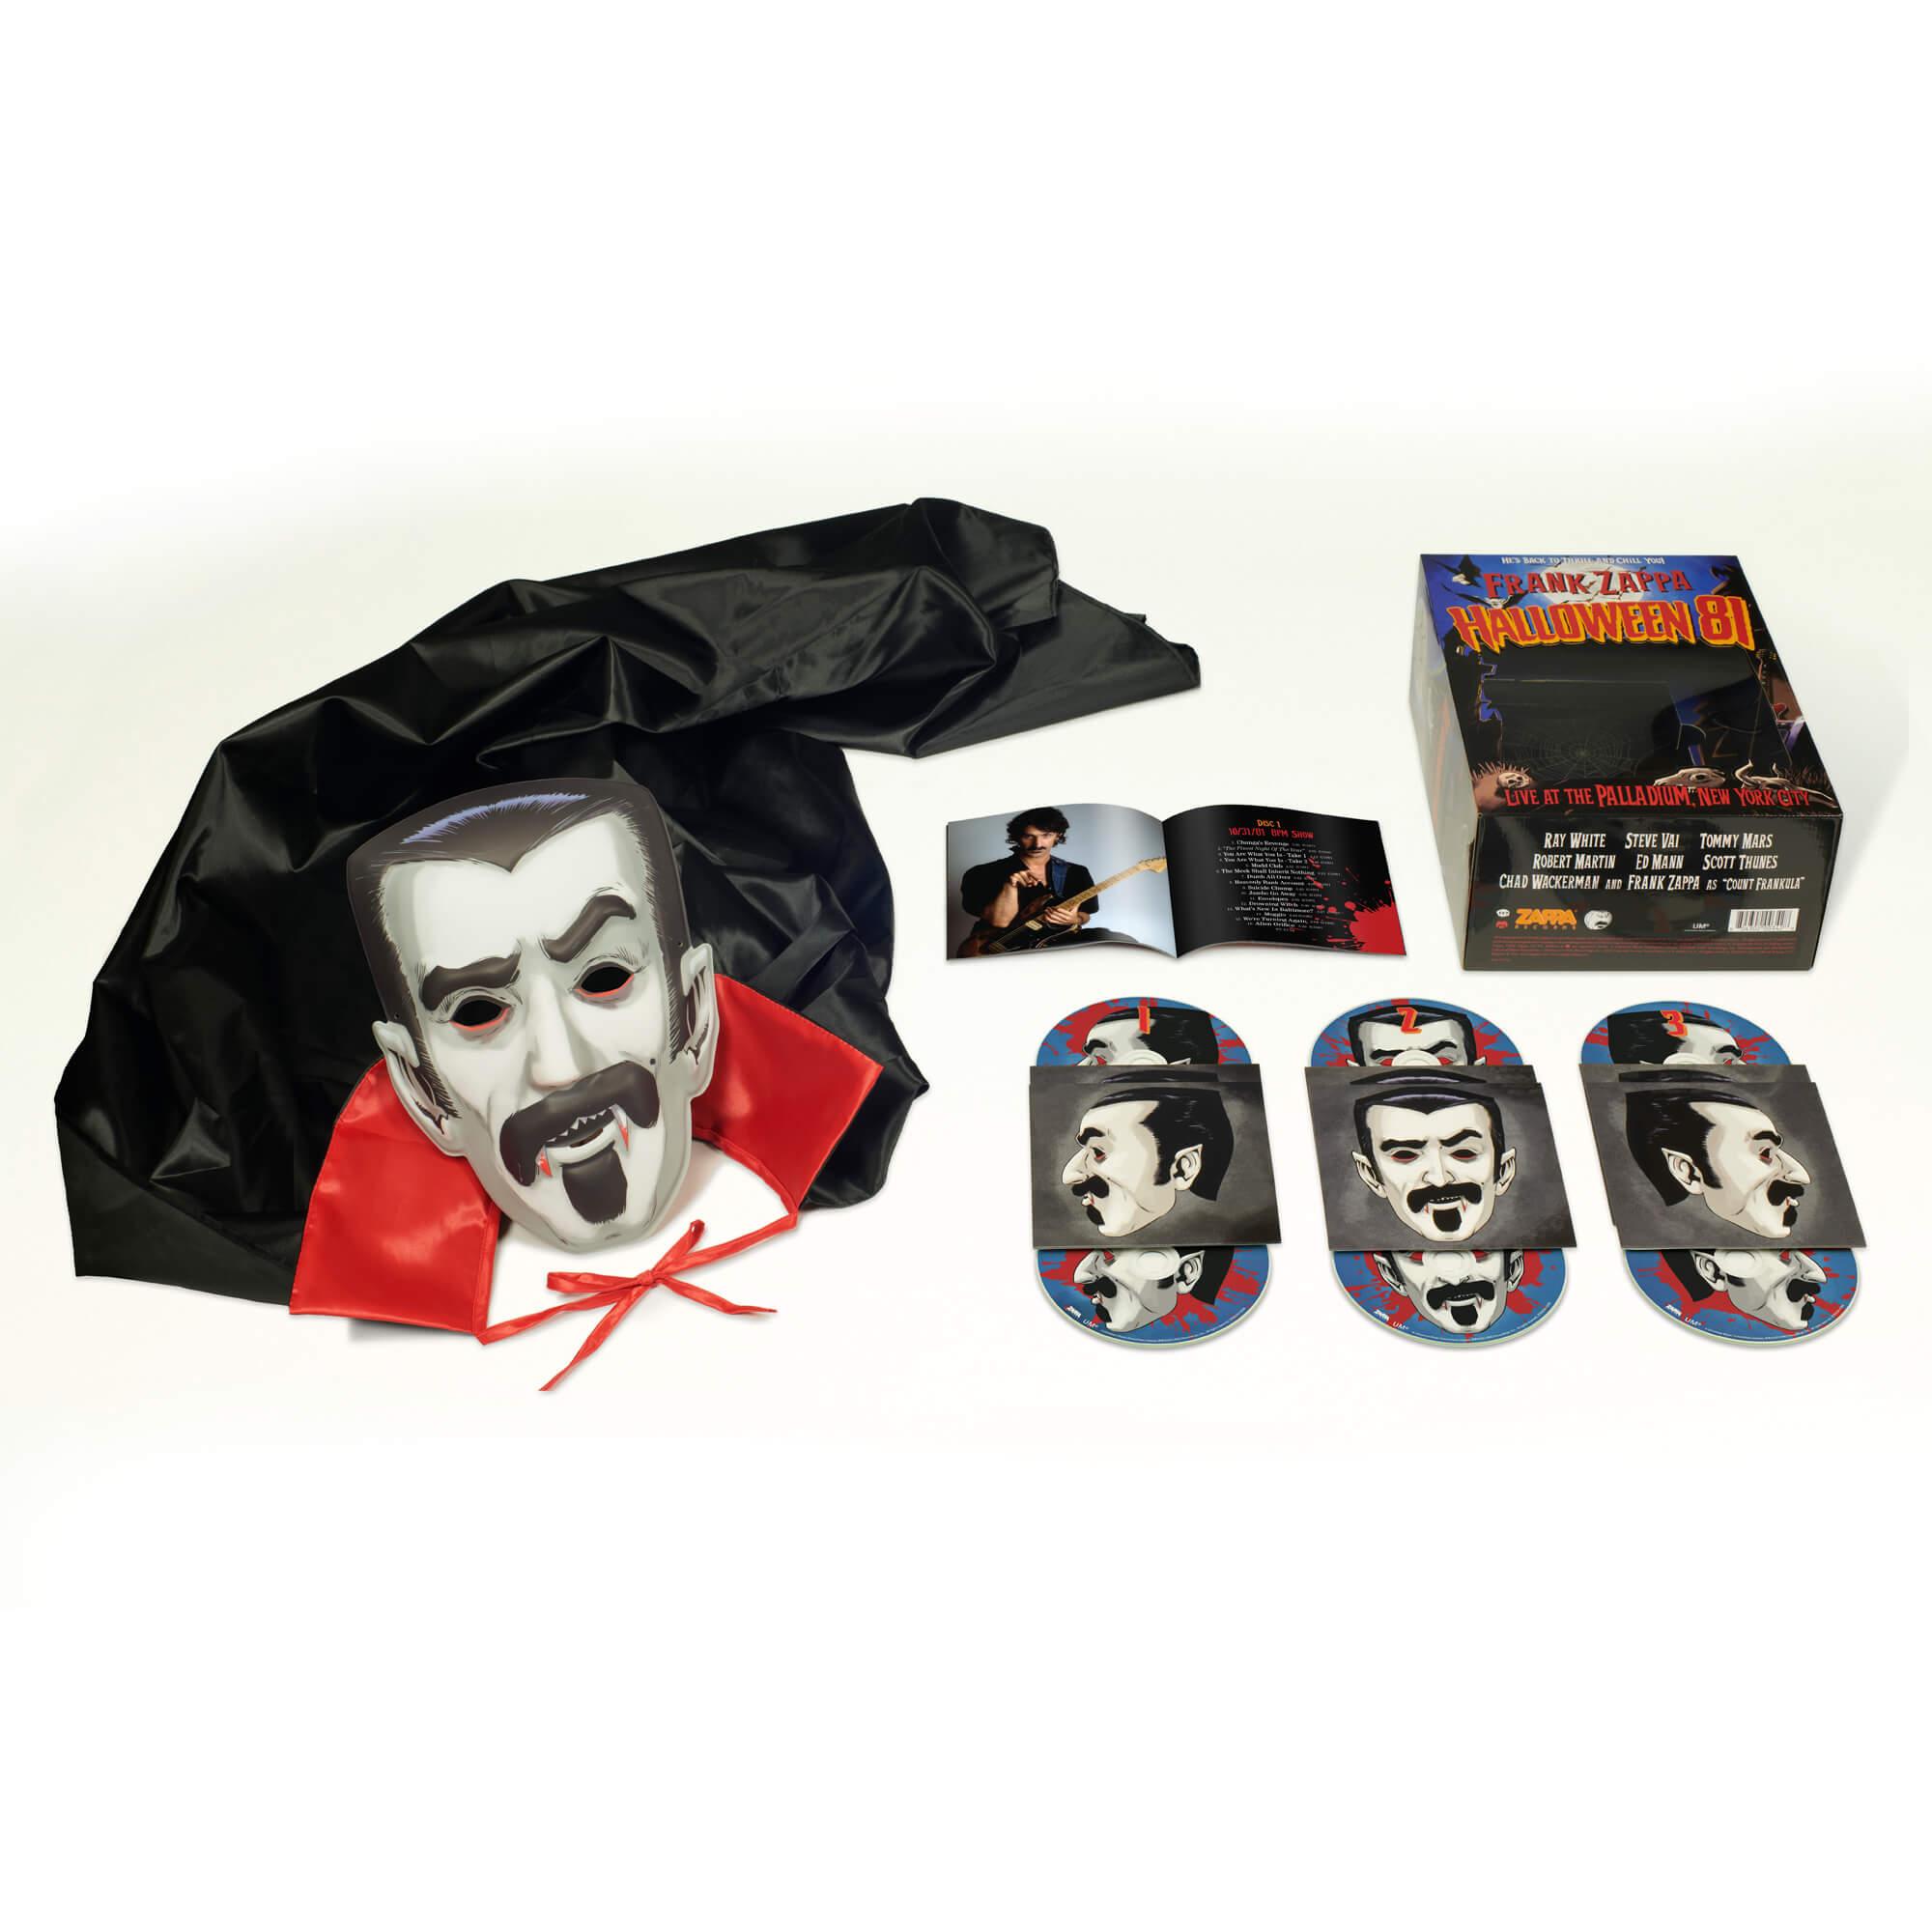 Frank Zappa - Halloween 81